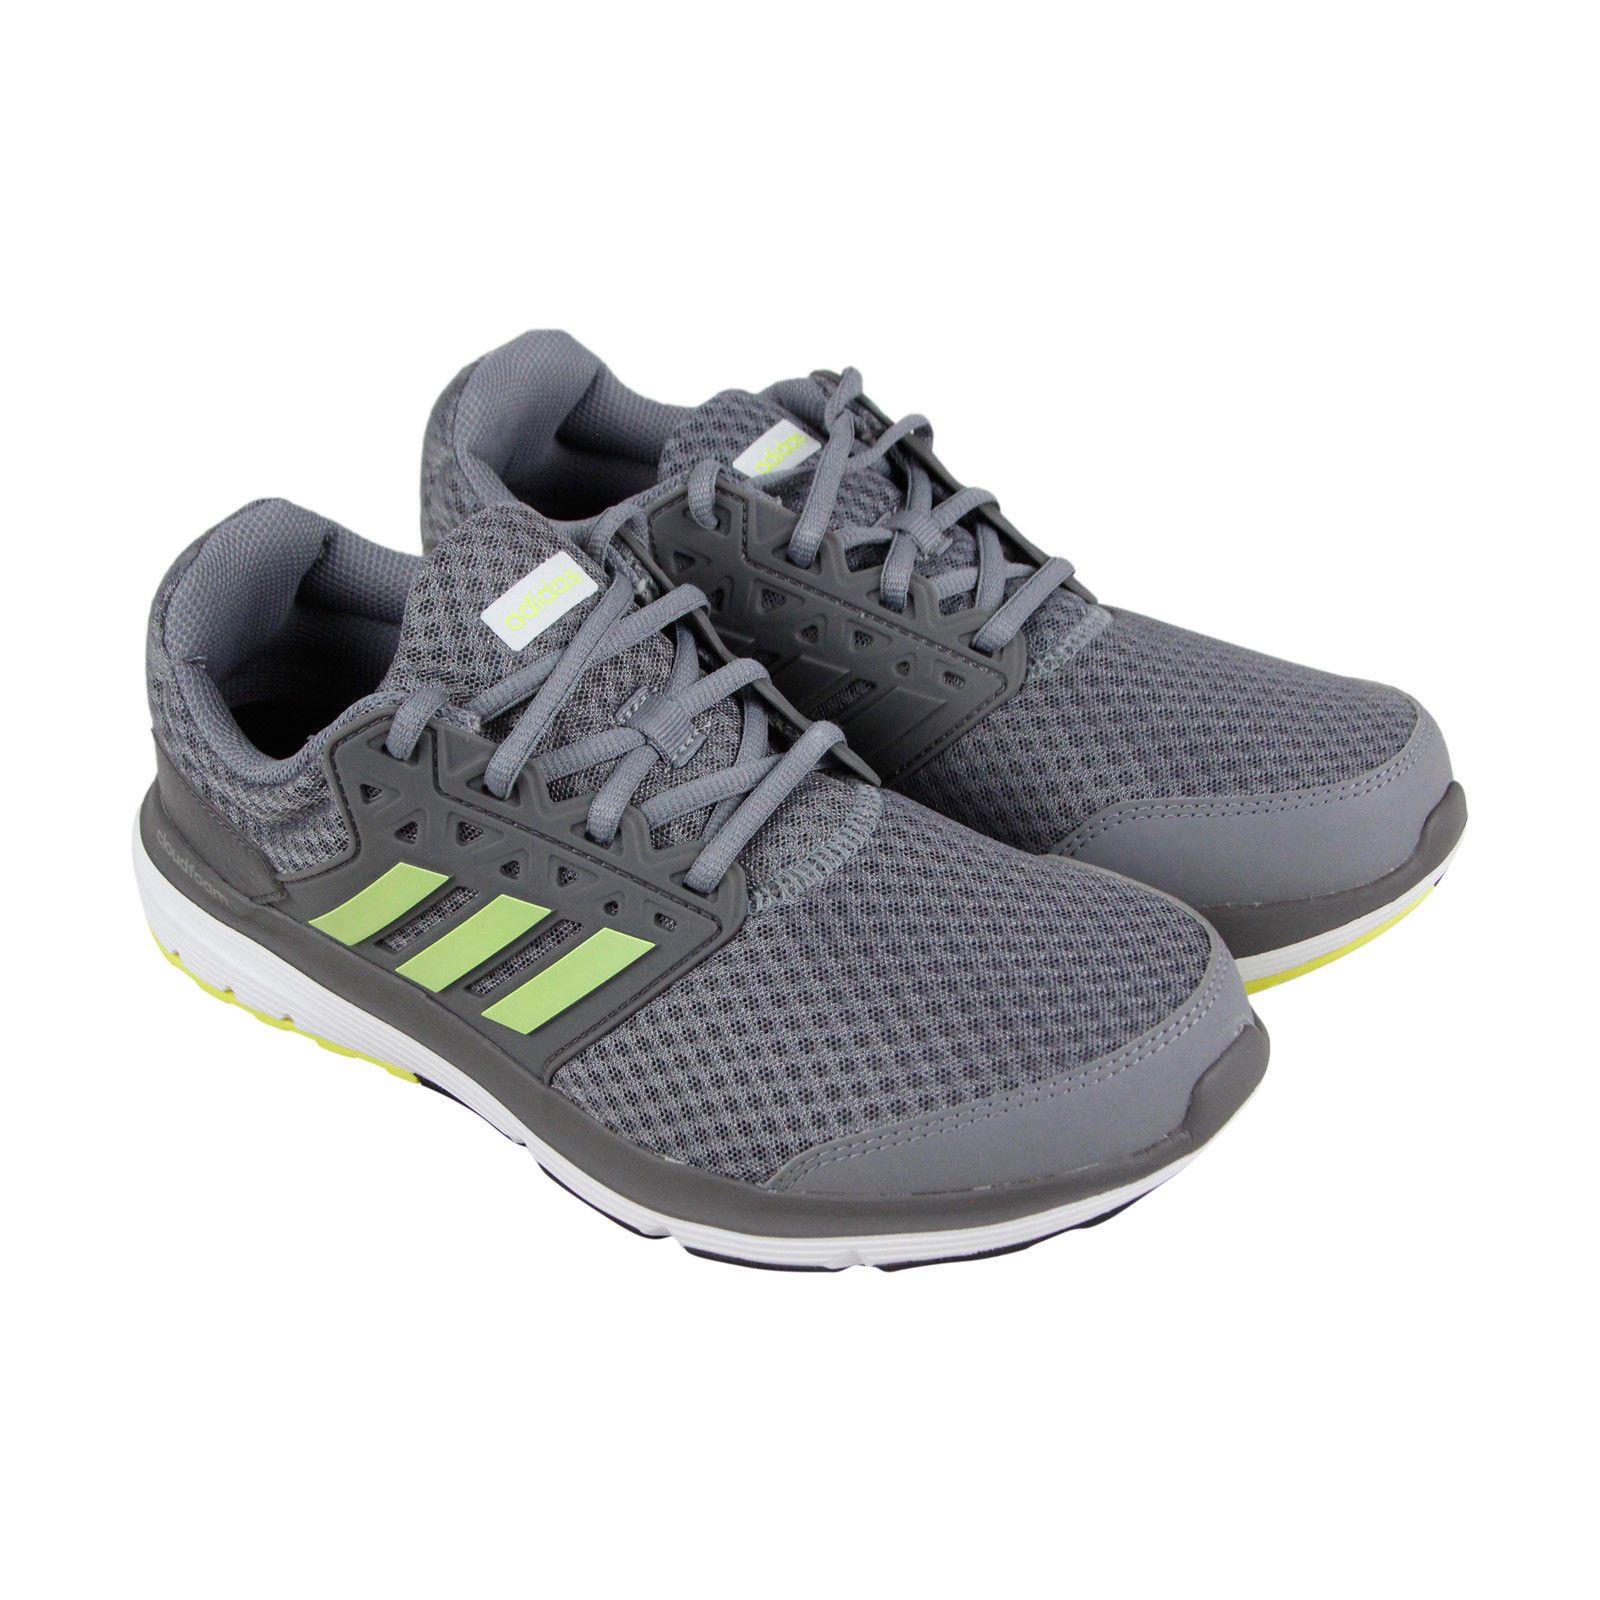 Cumplido Chimenea podar  Adidas Galaxy 3 M Mens Gray Mesh Athletic Lace Up Running Shoes 8 | Sneaker  head, Vintage sneakers, Trendy sneakers